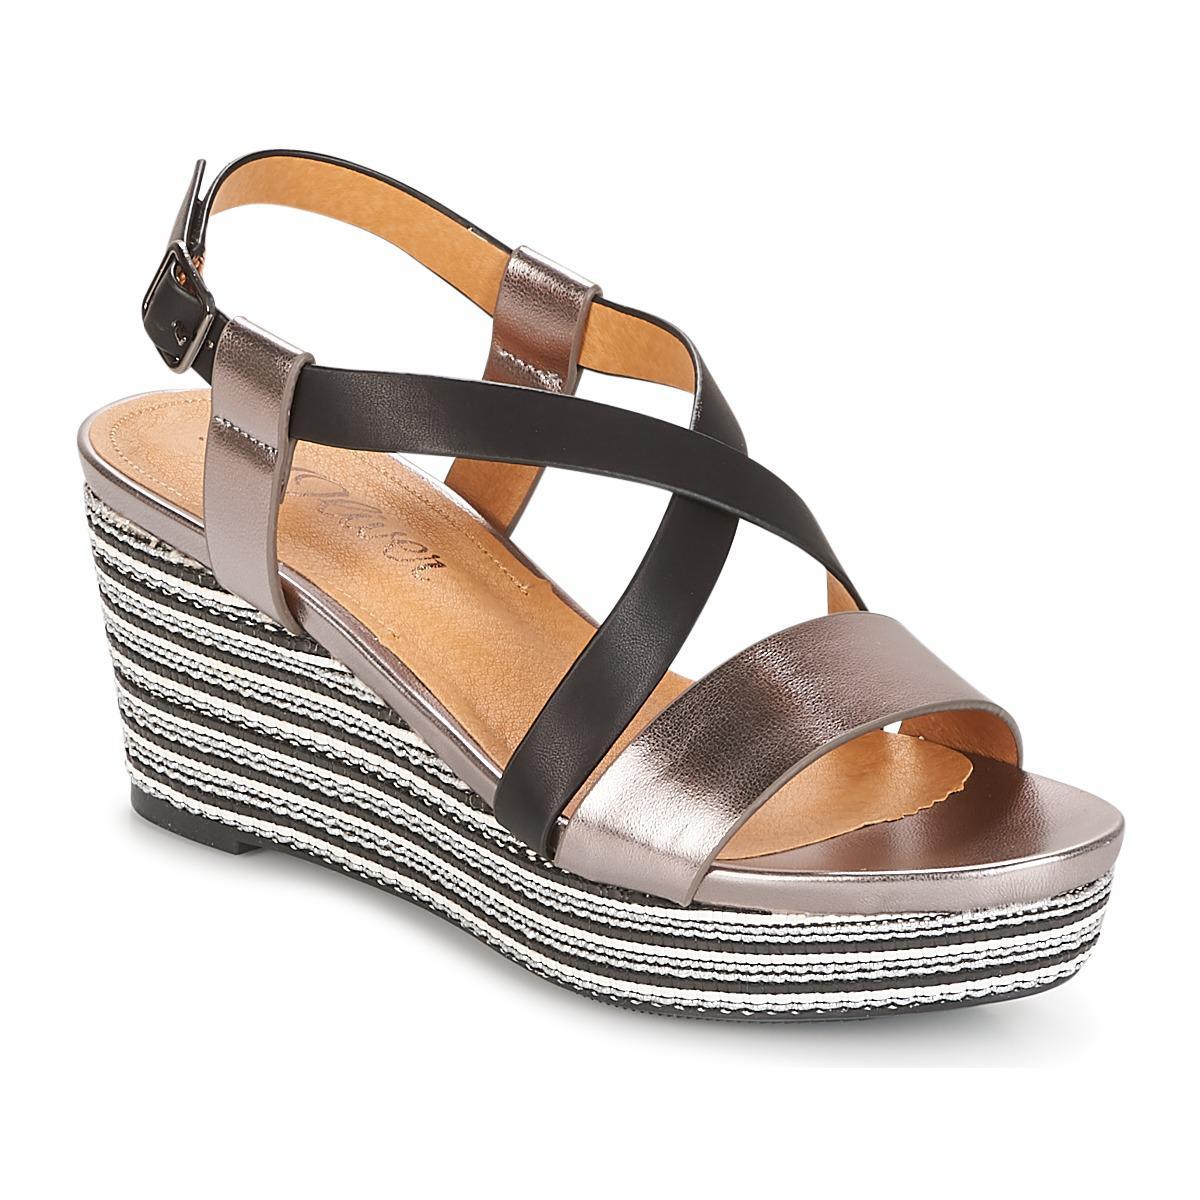 a4996b11fe S.oliver - Loupiole Women's Sandals In Black - Lyst. View fullscreen